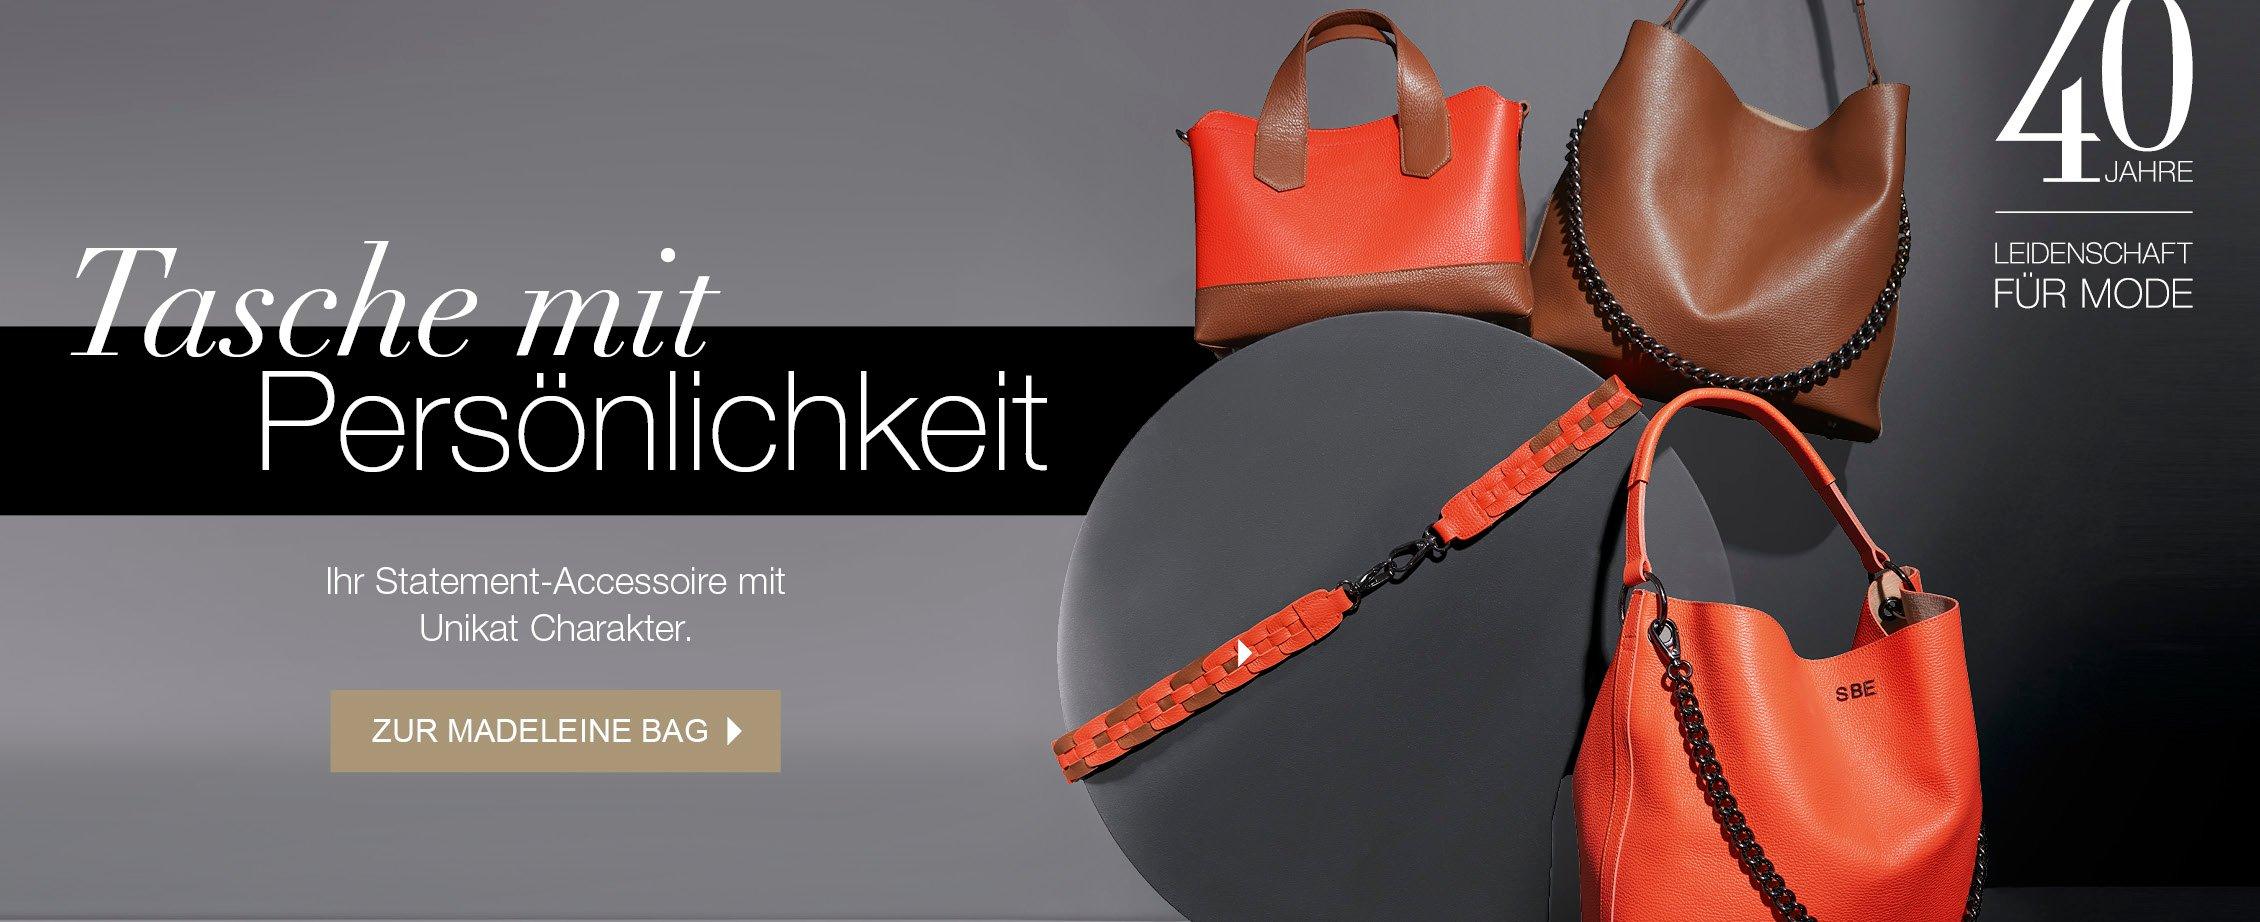 Die MADELEINE Bag